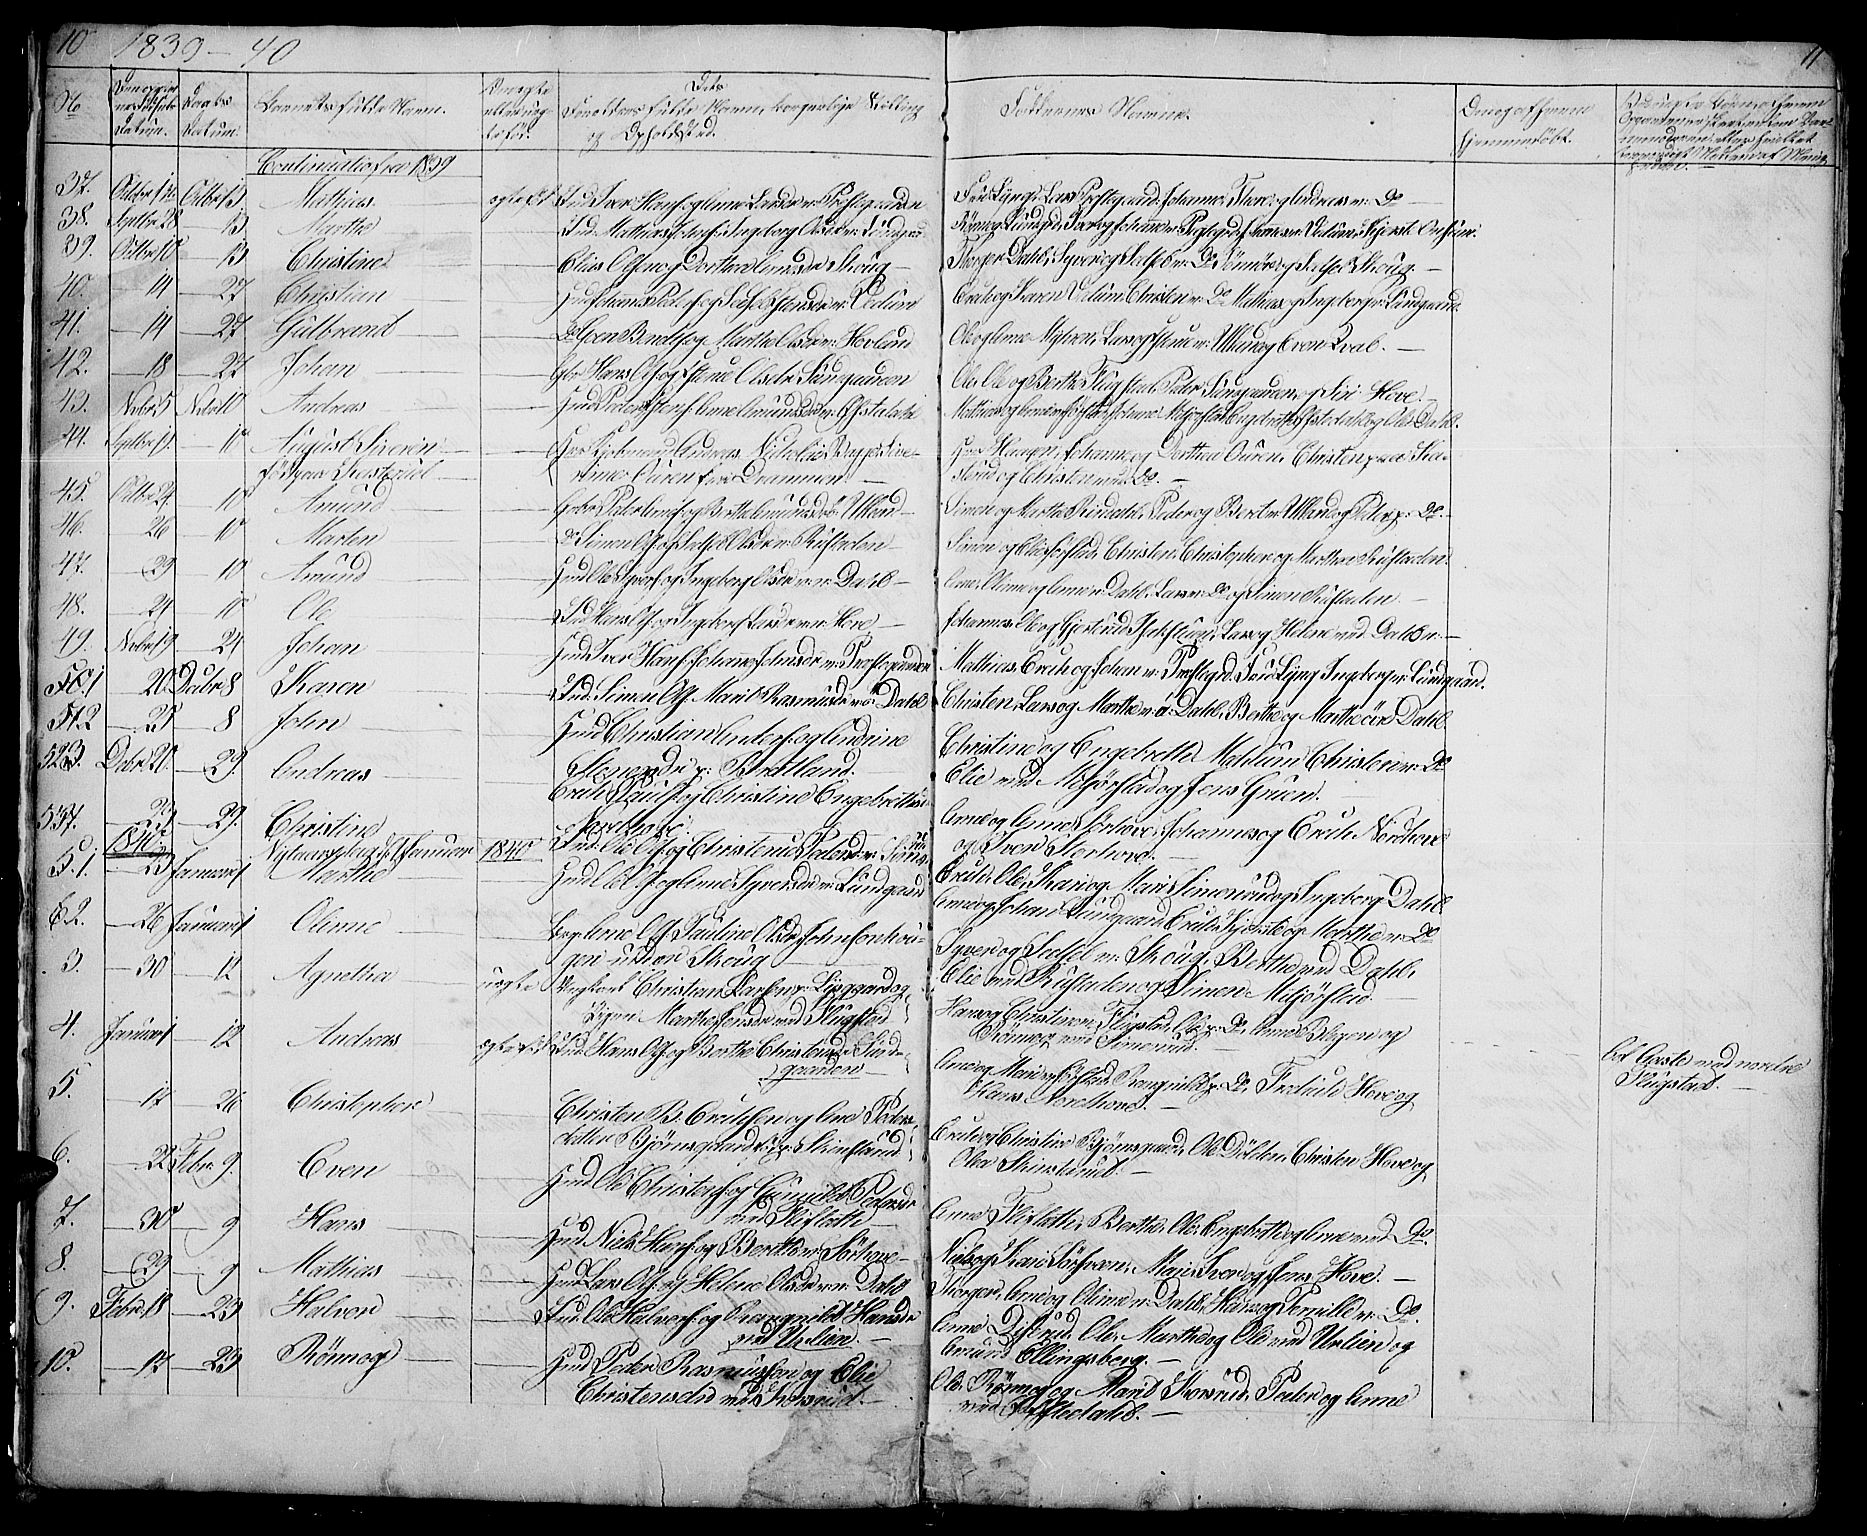 SAH, Fåberg prestekontor, Klokkerbok nr. 5, 1837-1864, s. 10-11